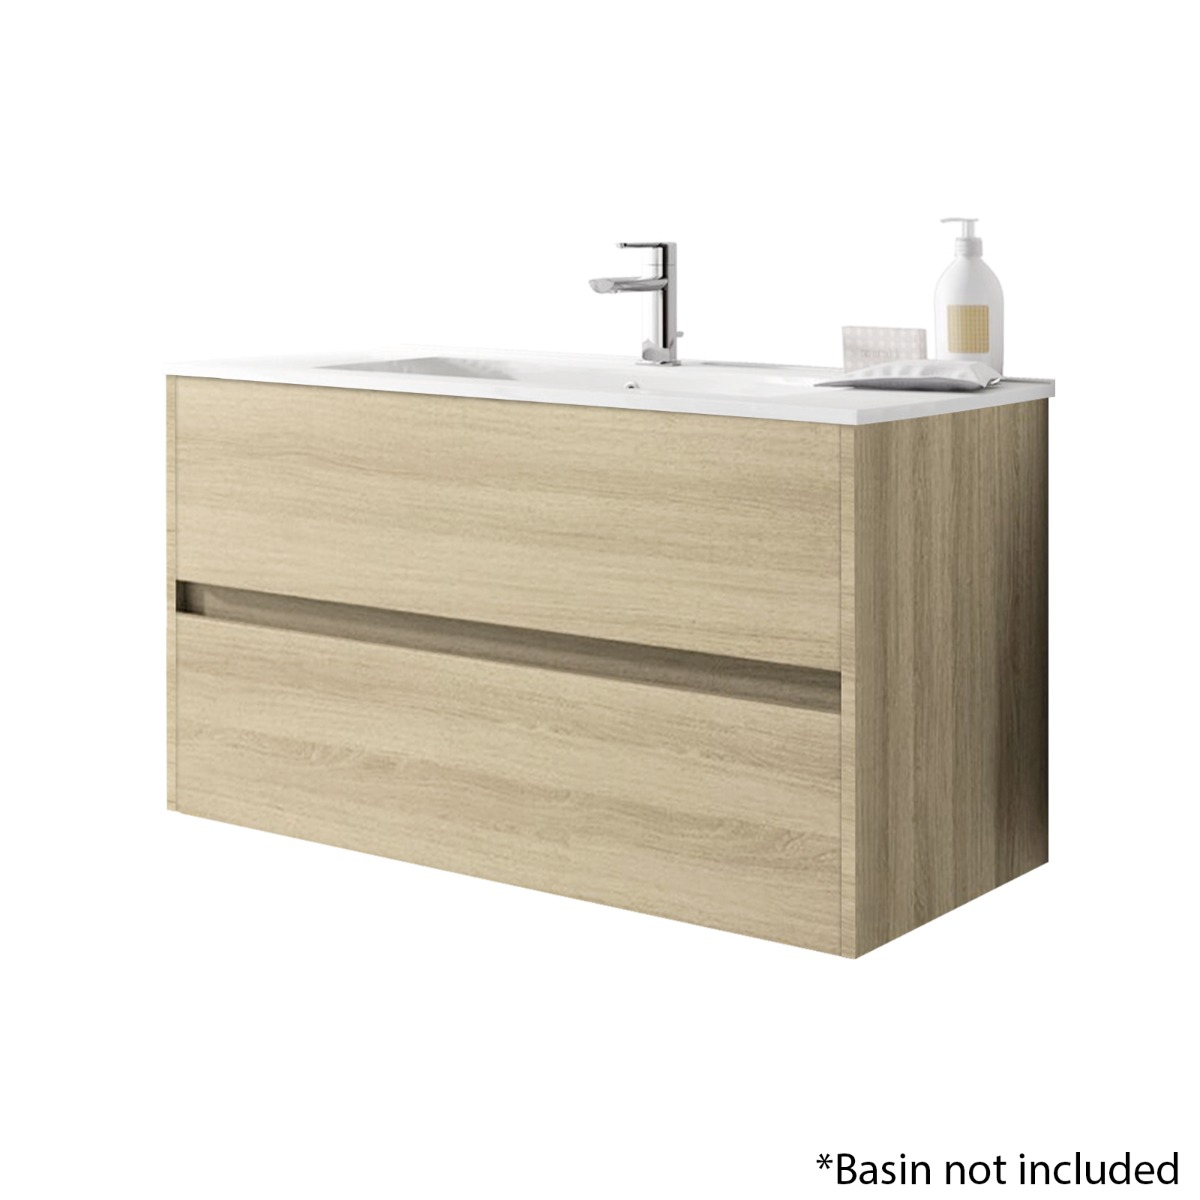 Alba 100cm 2 Drawer Basin Unit in European Oak